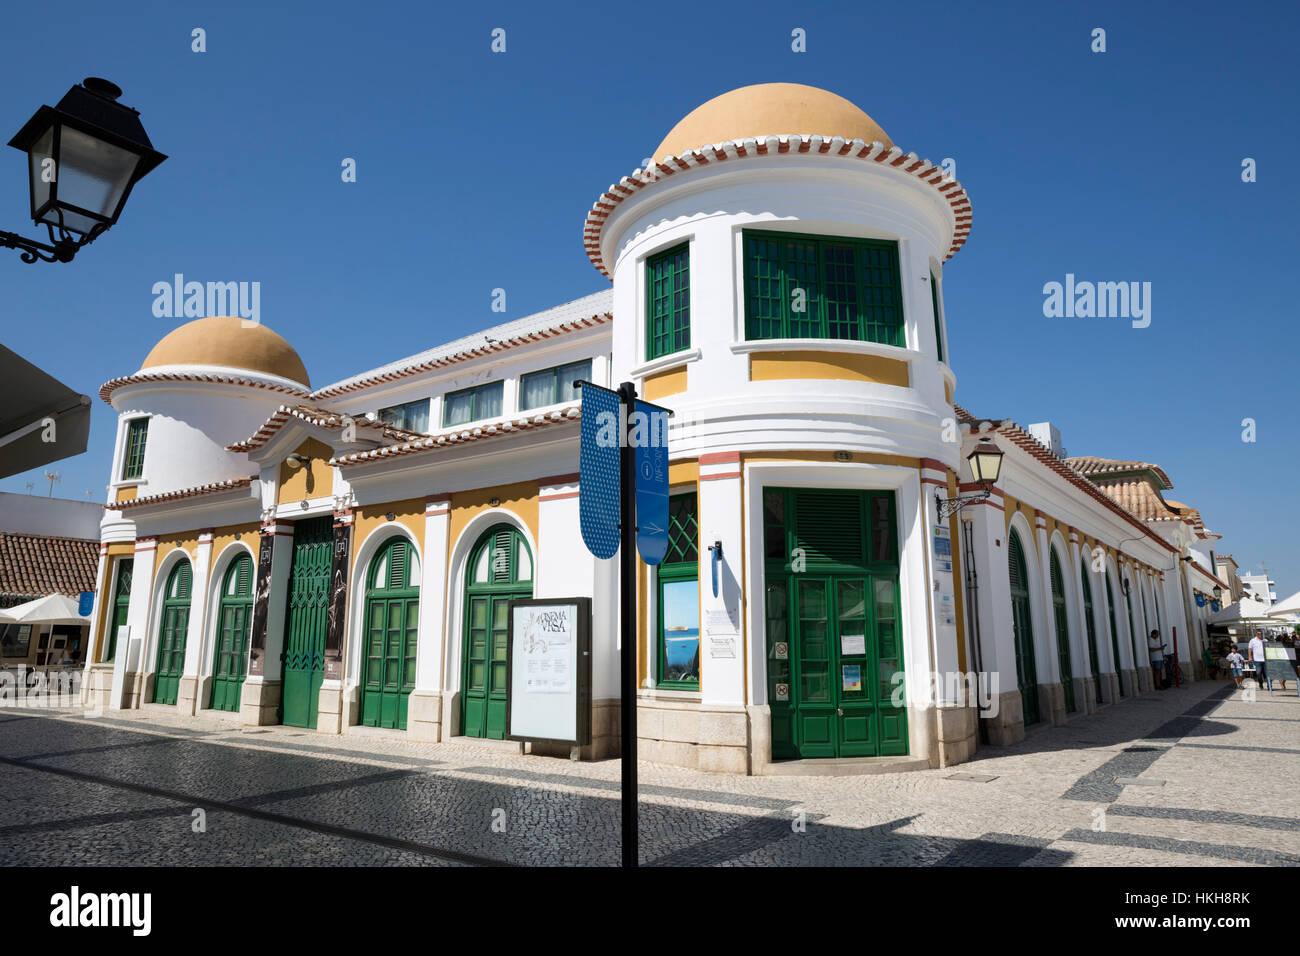 The Barracks (now housing the Antonio Aleixo Cultural Centre), Vila Real de Santo Antonio, Algarve, Portugal, Europe - Stock Image